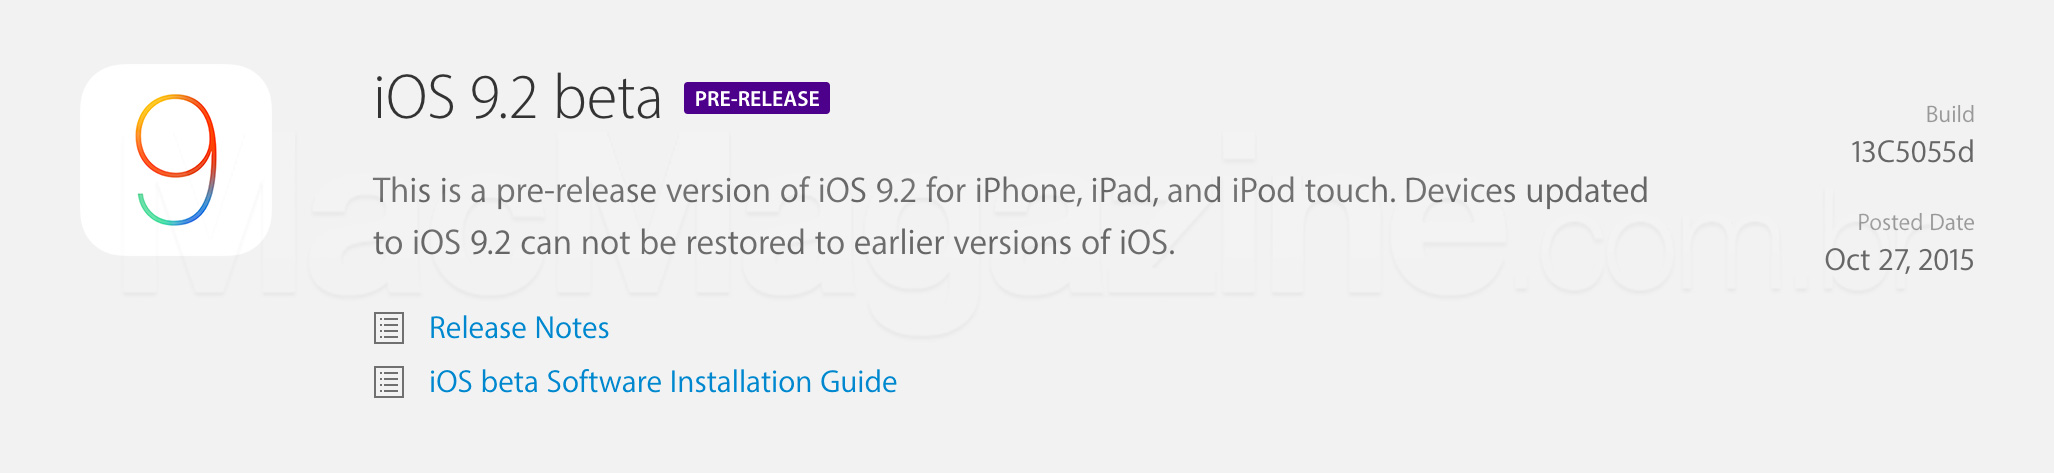 iOS 9.2 beta